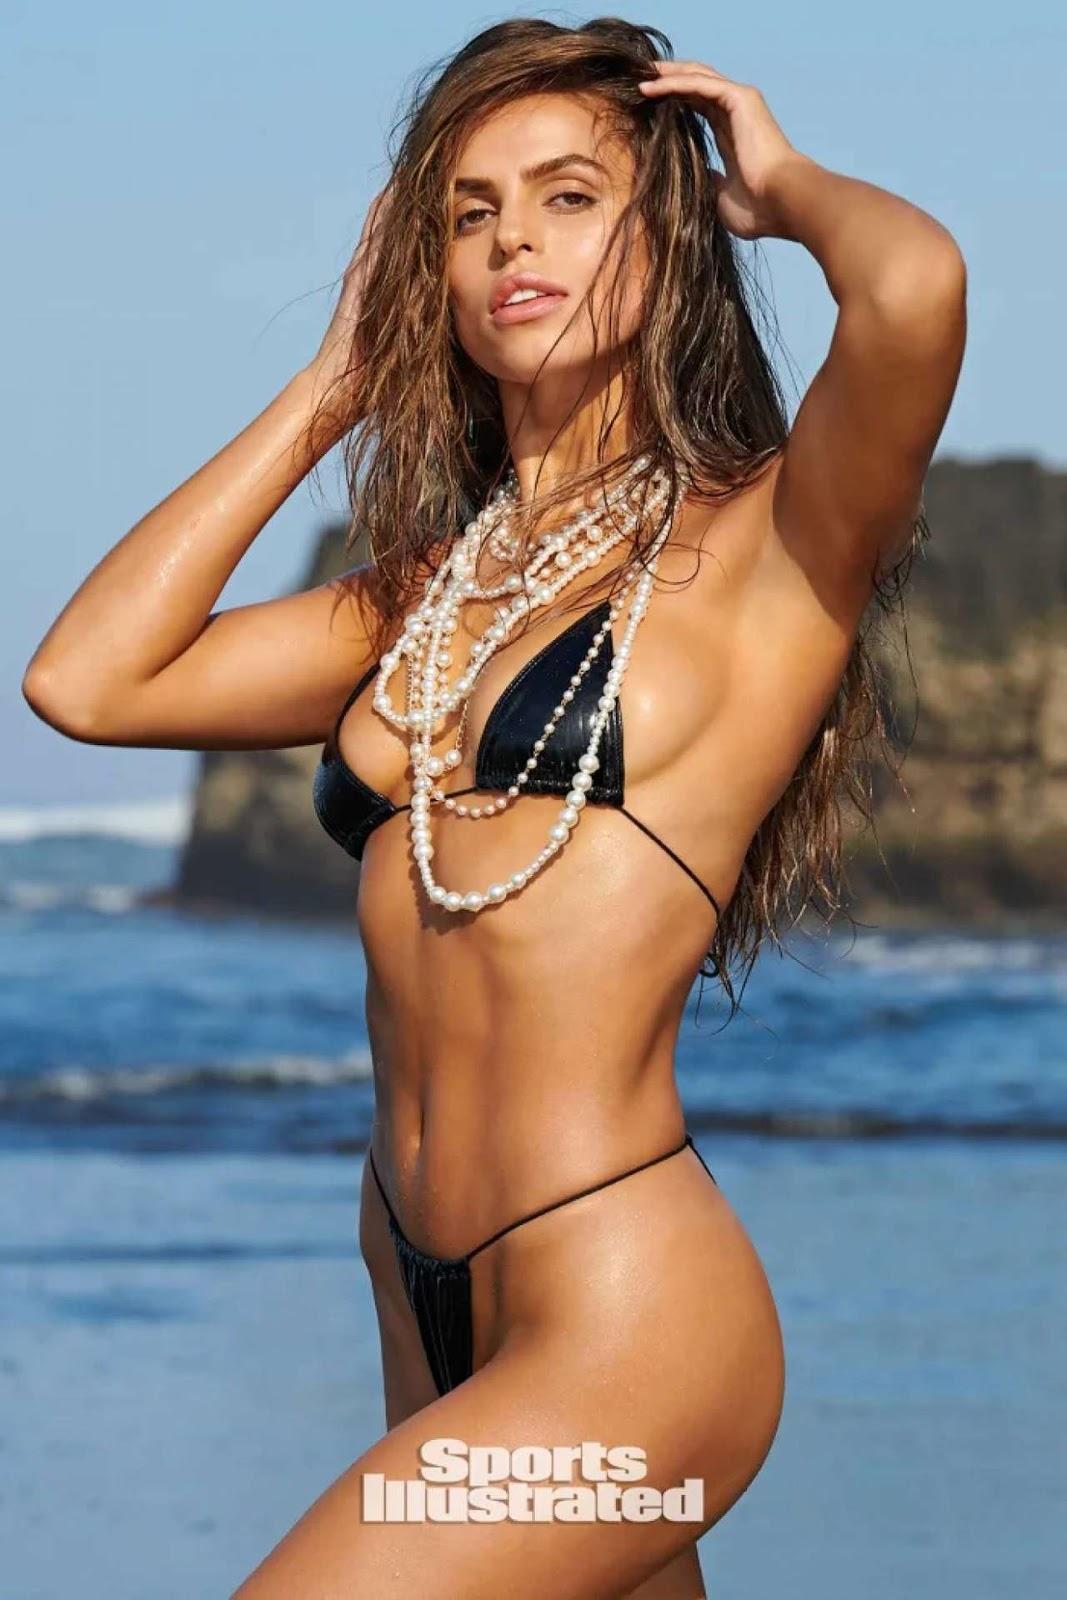 Brooks Nader Spicy Photos in Bikini